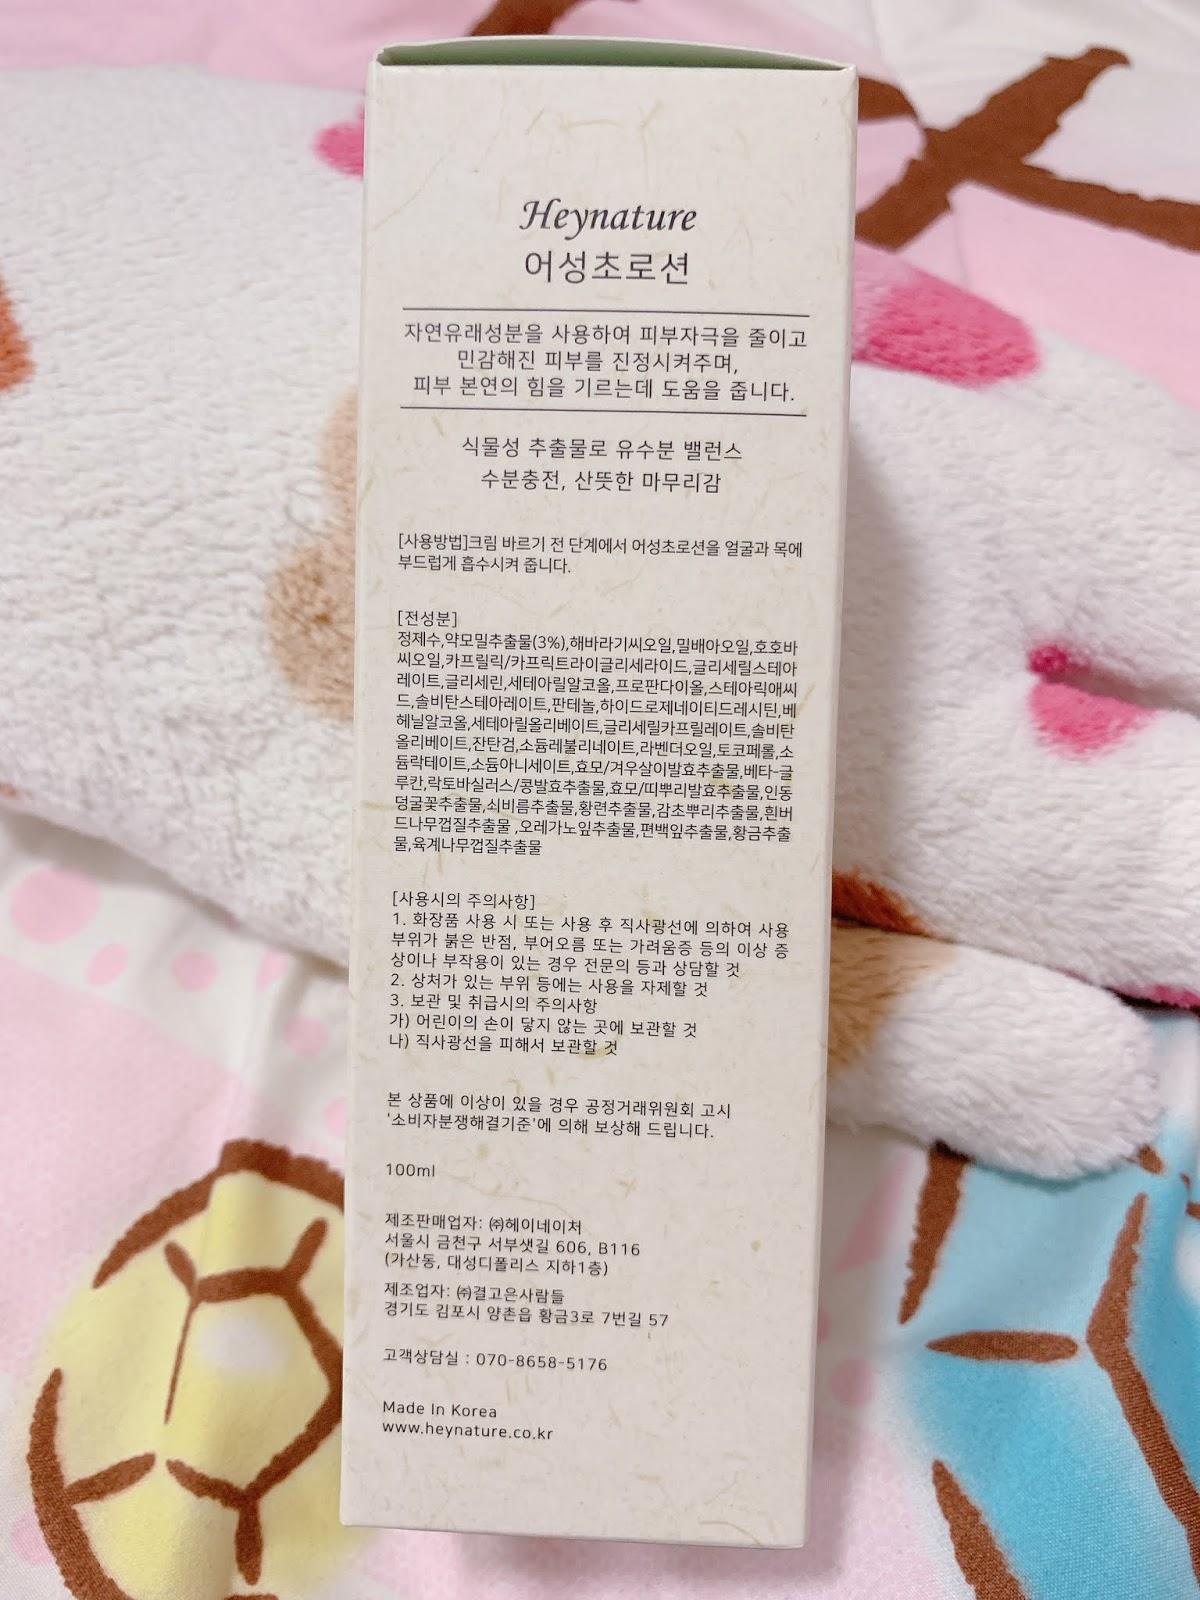 63000d228986 Beautylife HK - ◕◡◕舒緩鎮靜‧保濕修復♥Heynature魚腥草系列 ...